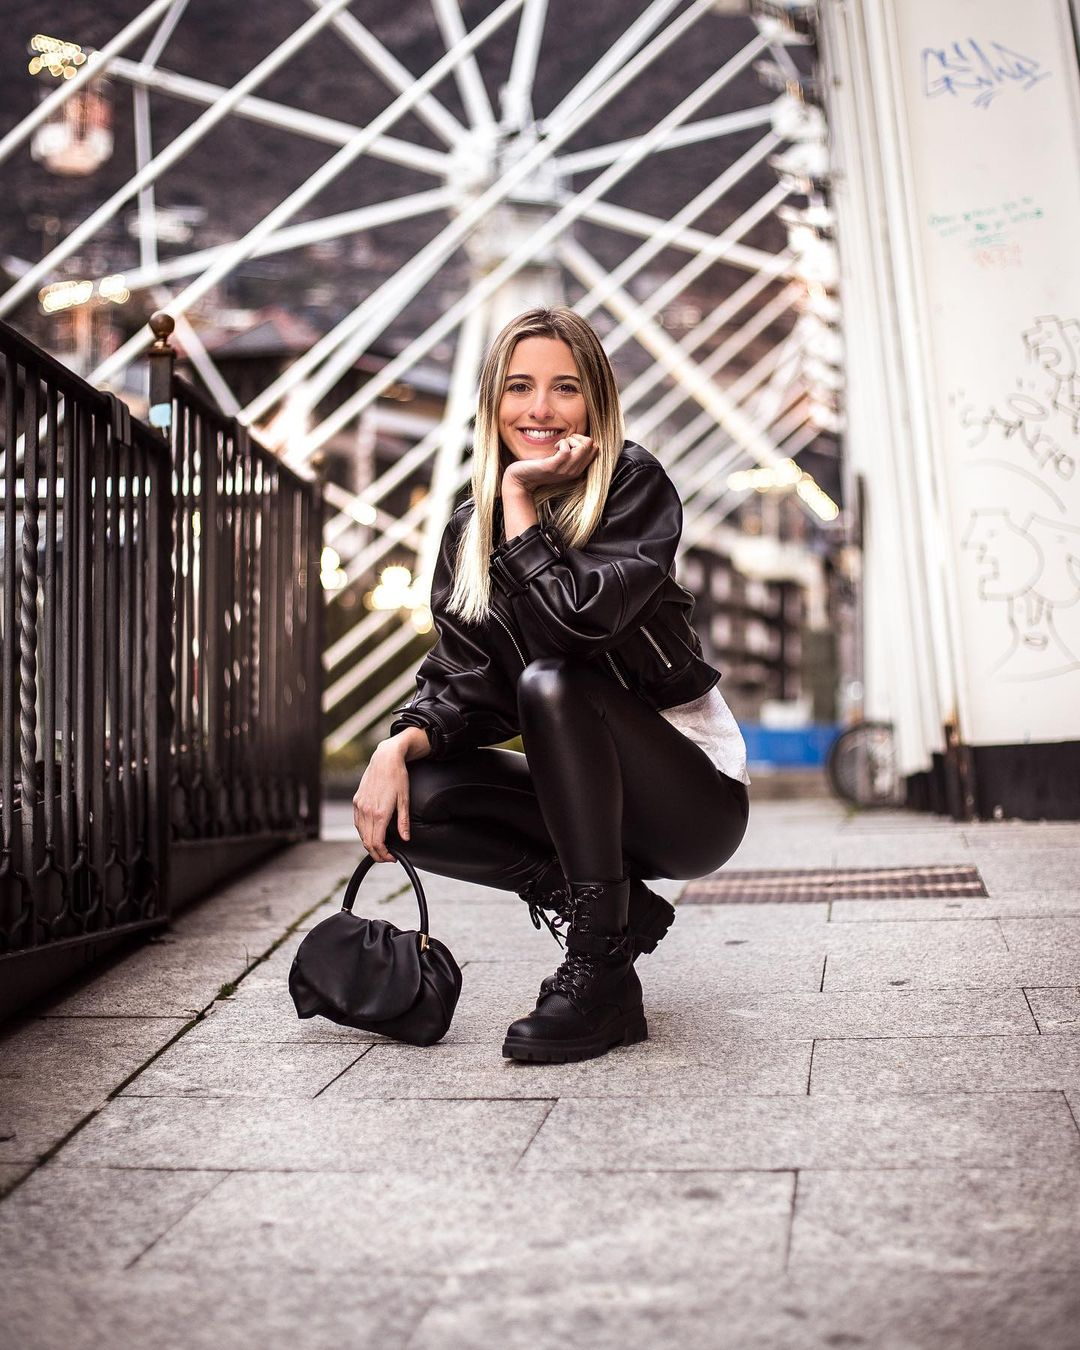 Gemma-Gallardo-Wallpapers-Insta-Fit-Bio-10